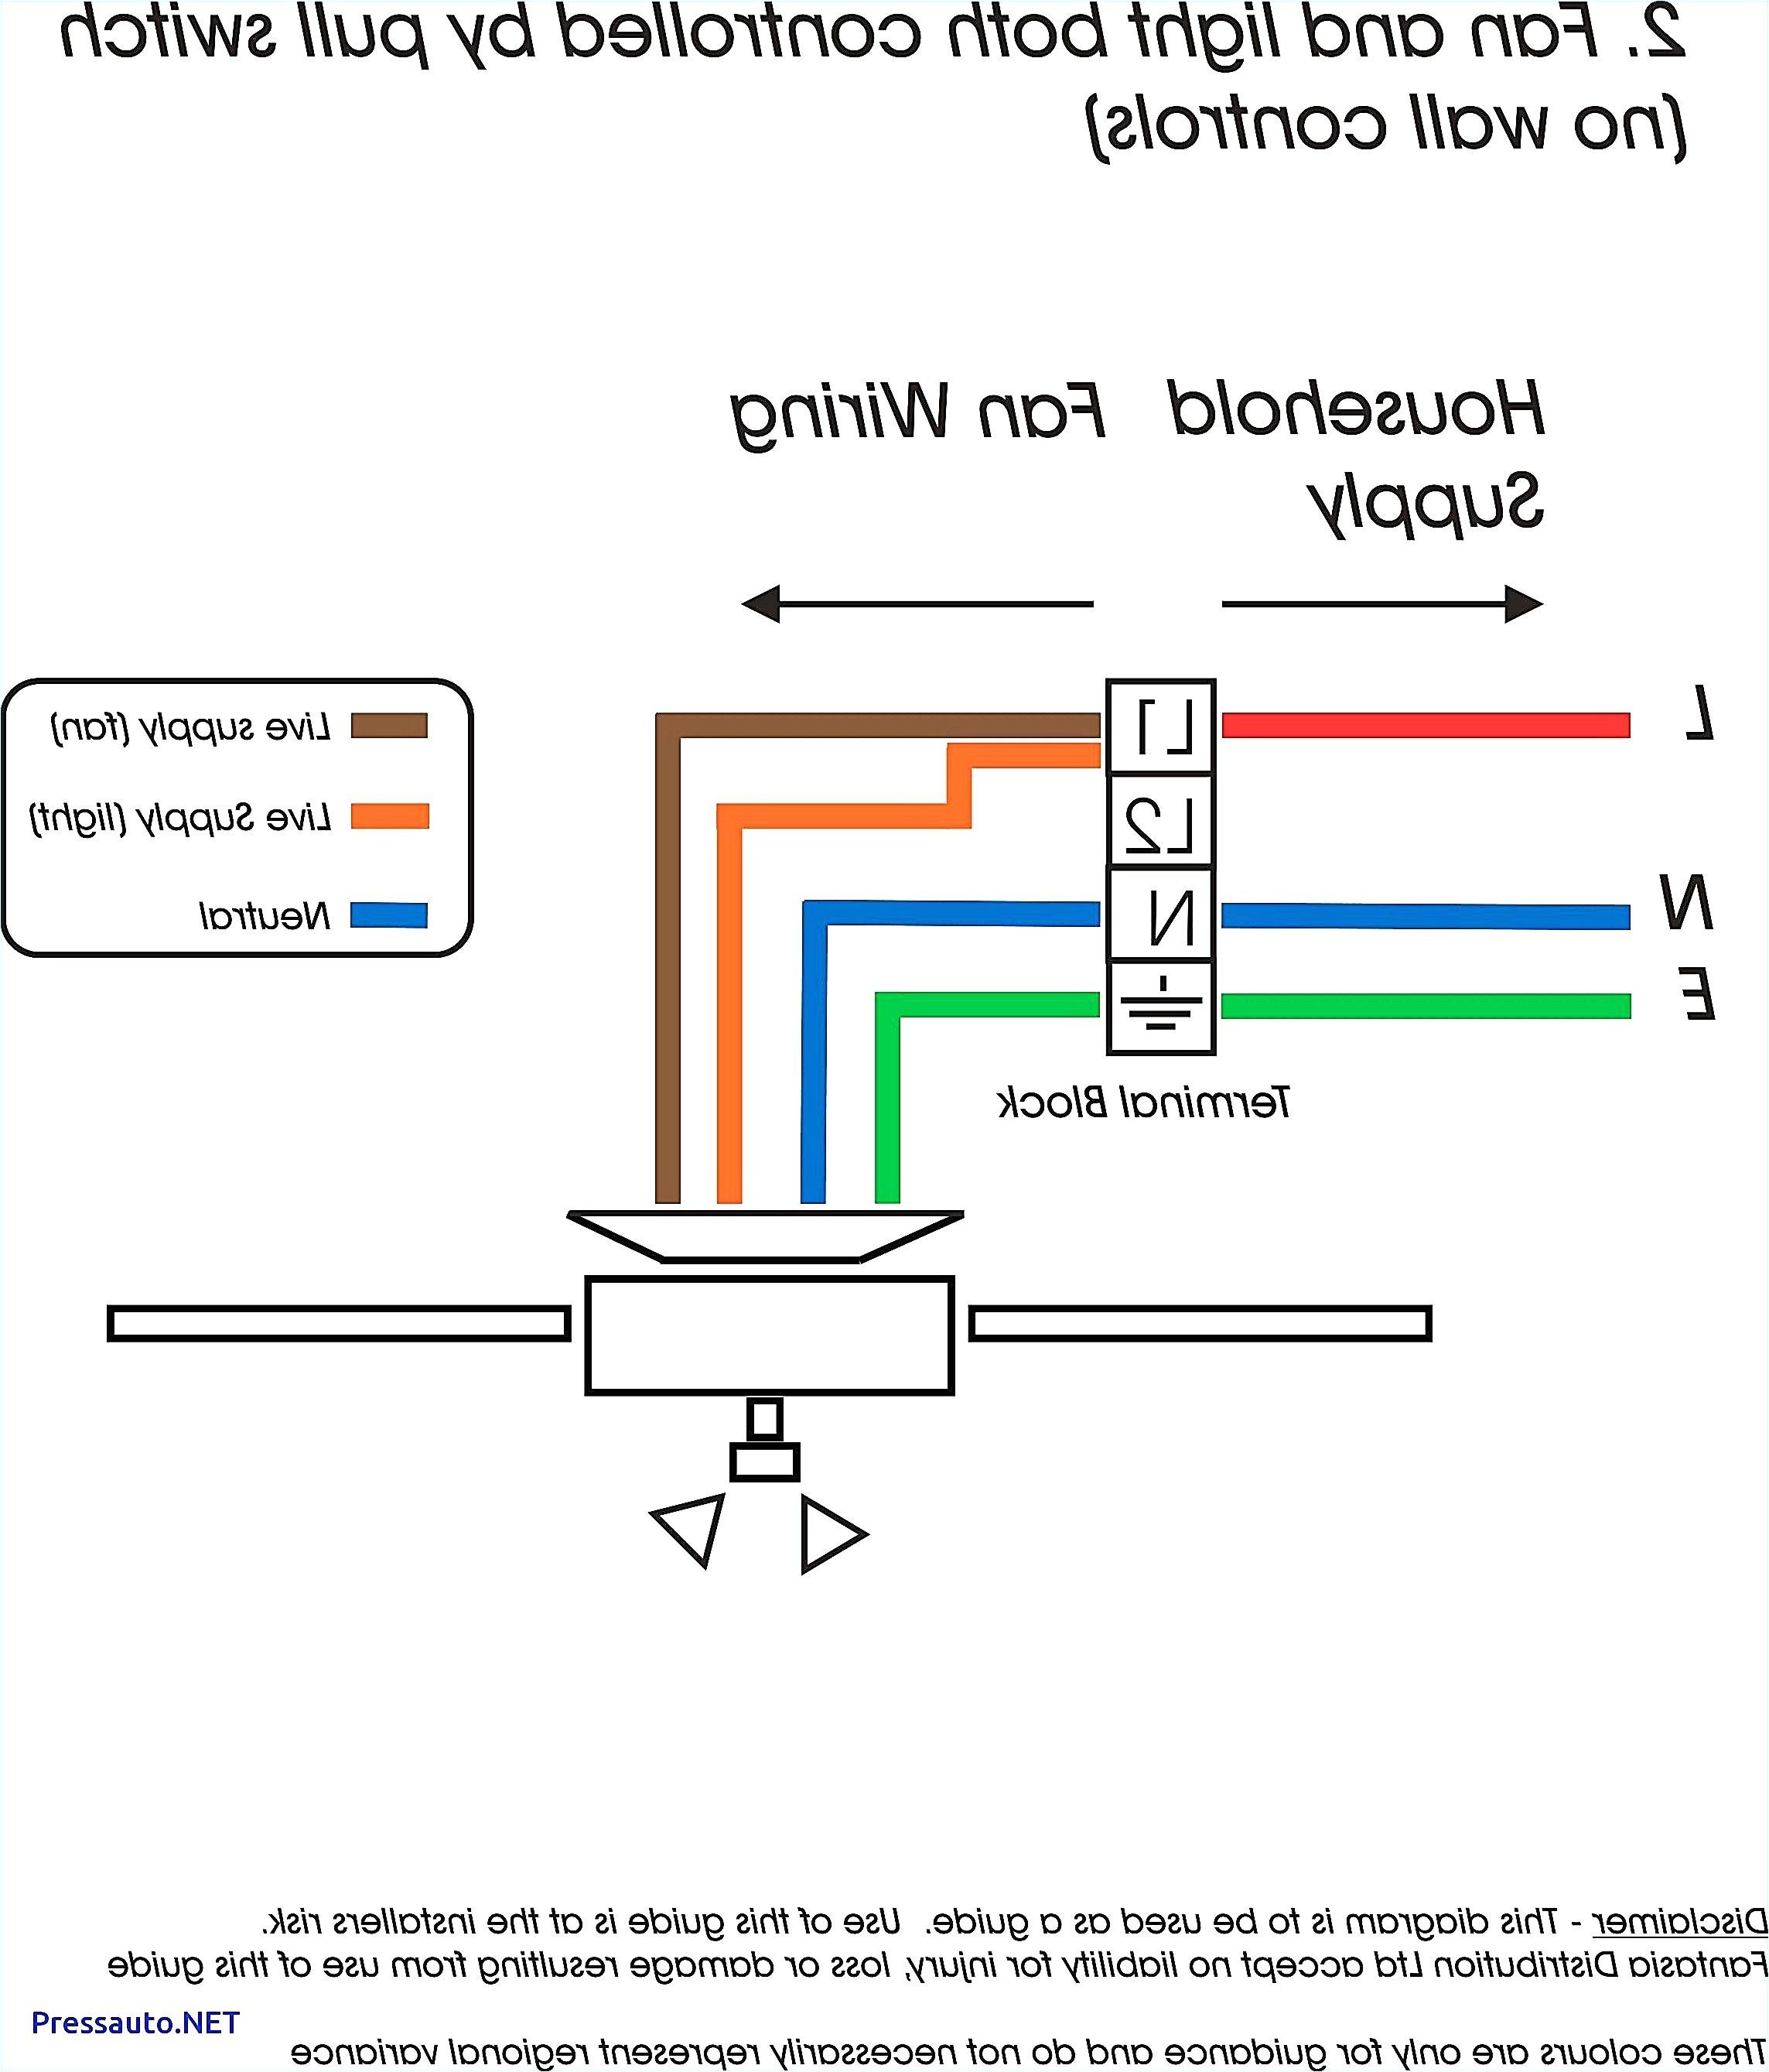 frenheit electric baseboard wiring diagram wiring diagram third level cabot electric baseboard wiring diagram